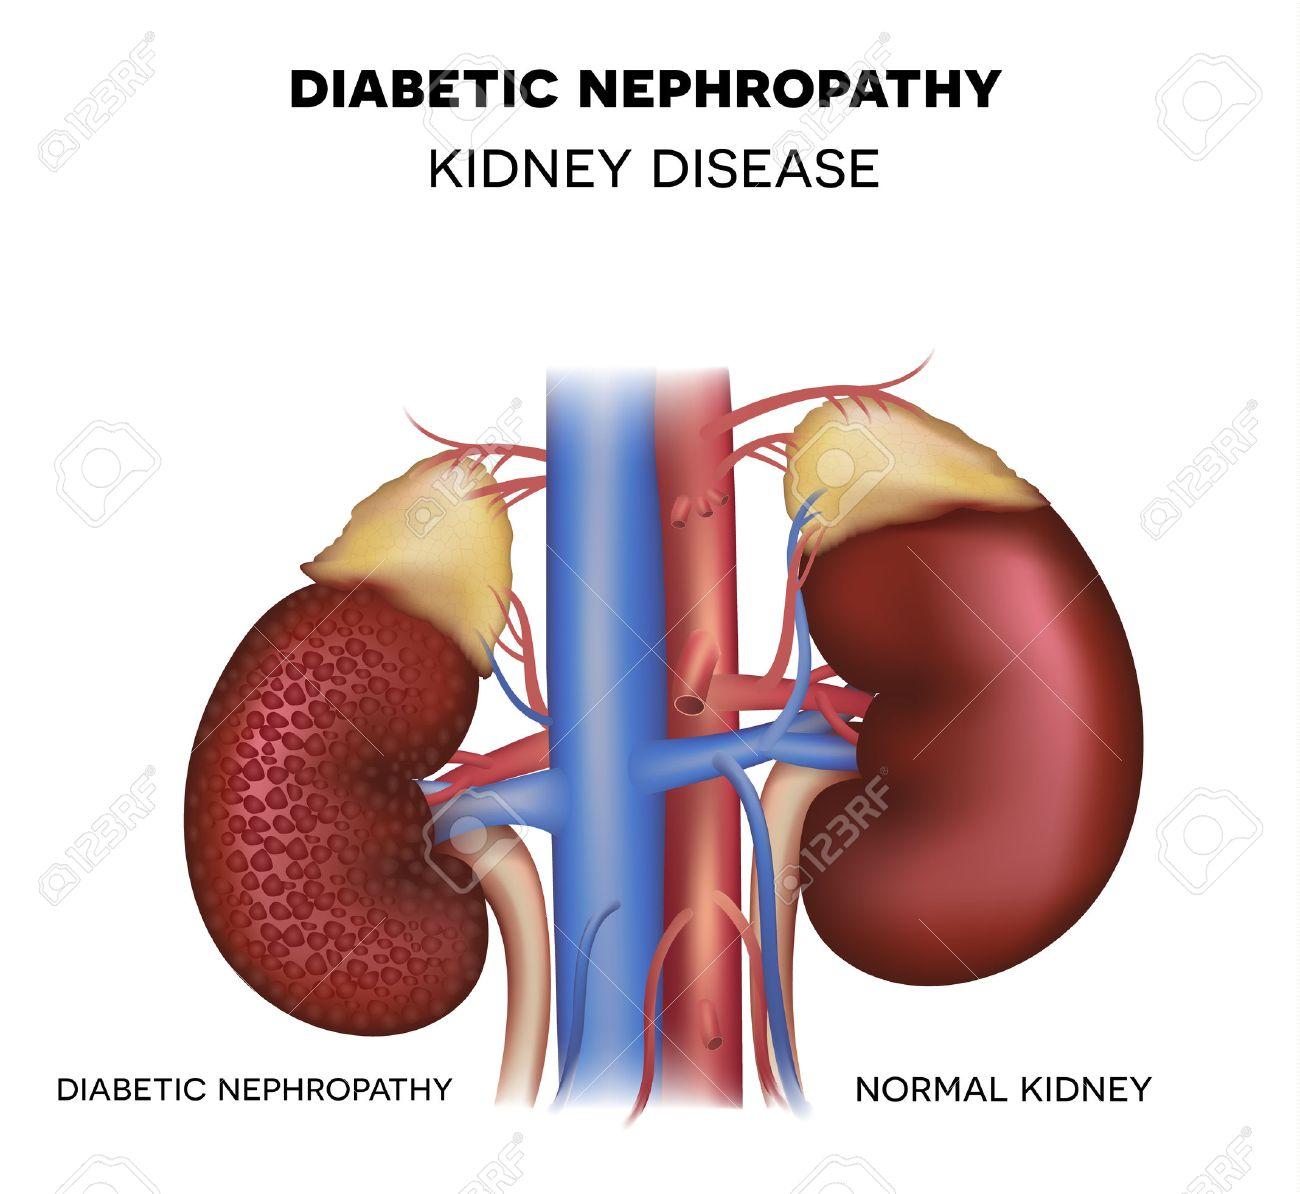 hight resolution of diabetic nephropathy kidney disease caused by diabetes stock vector 47999985